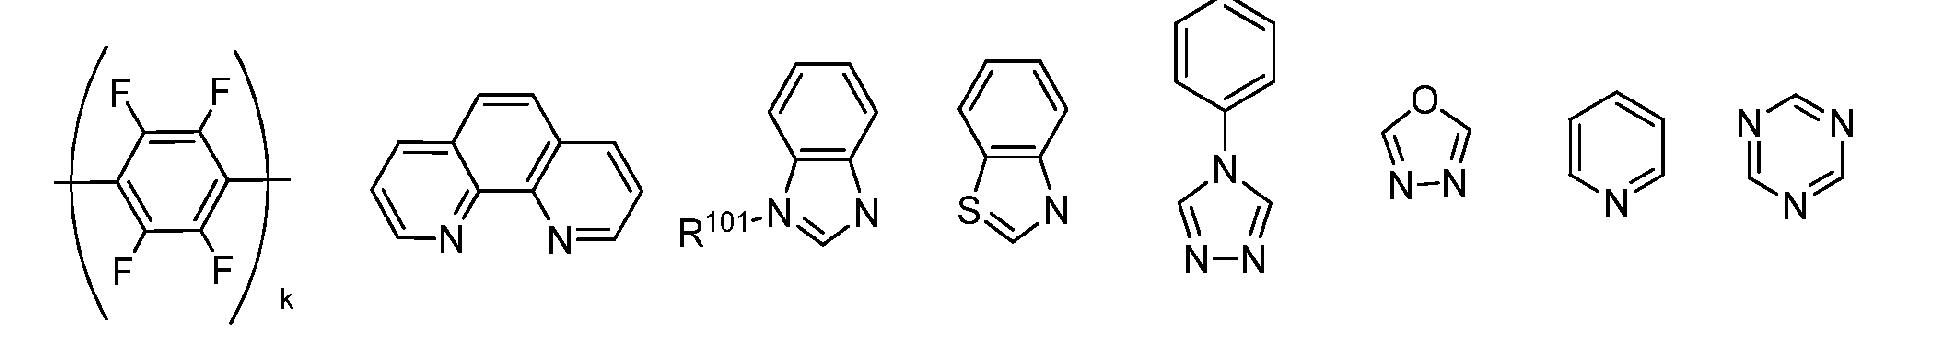 Figure imgb0939